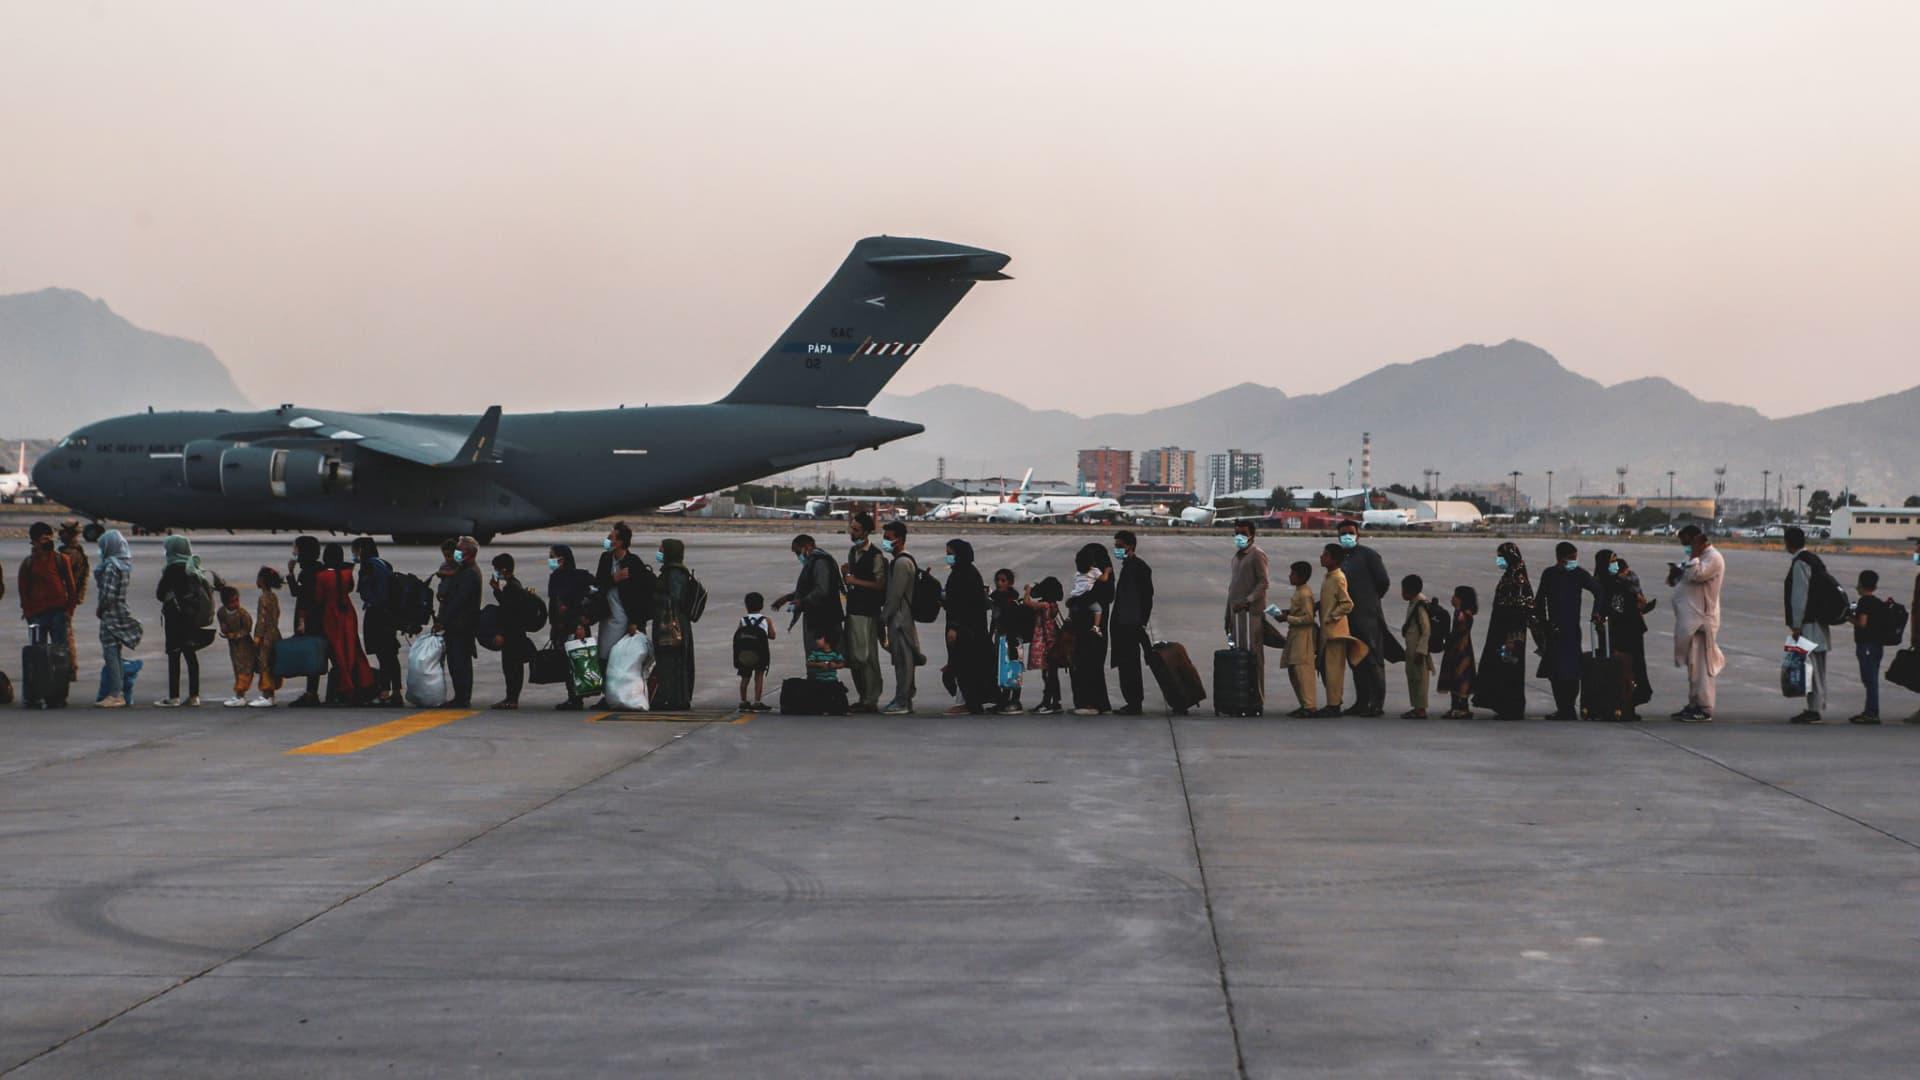 Evacuees wait to board a Boeing C-17 Globemaster III during an evacuation at Hamid Karzai International Airport in Kabul, Afghanistan, August 23, 2021.